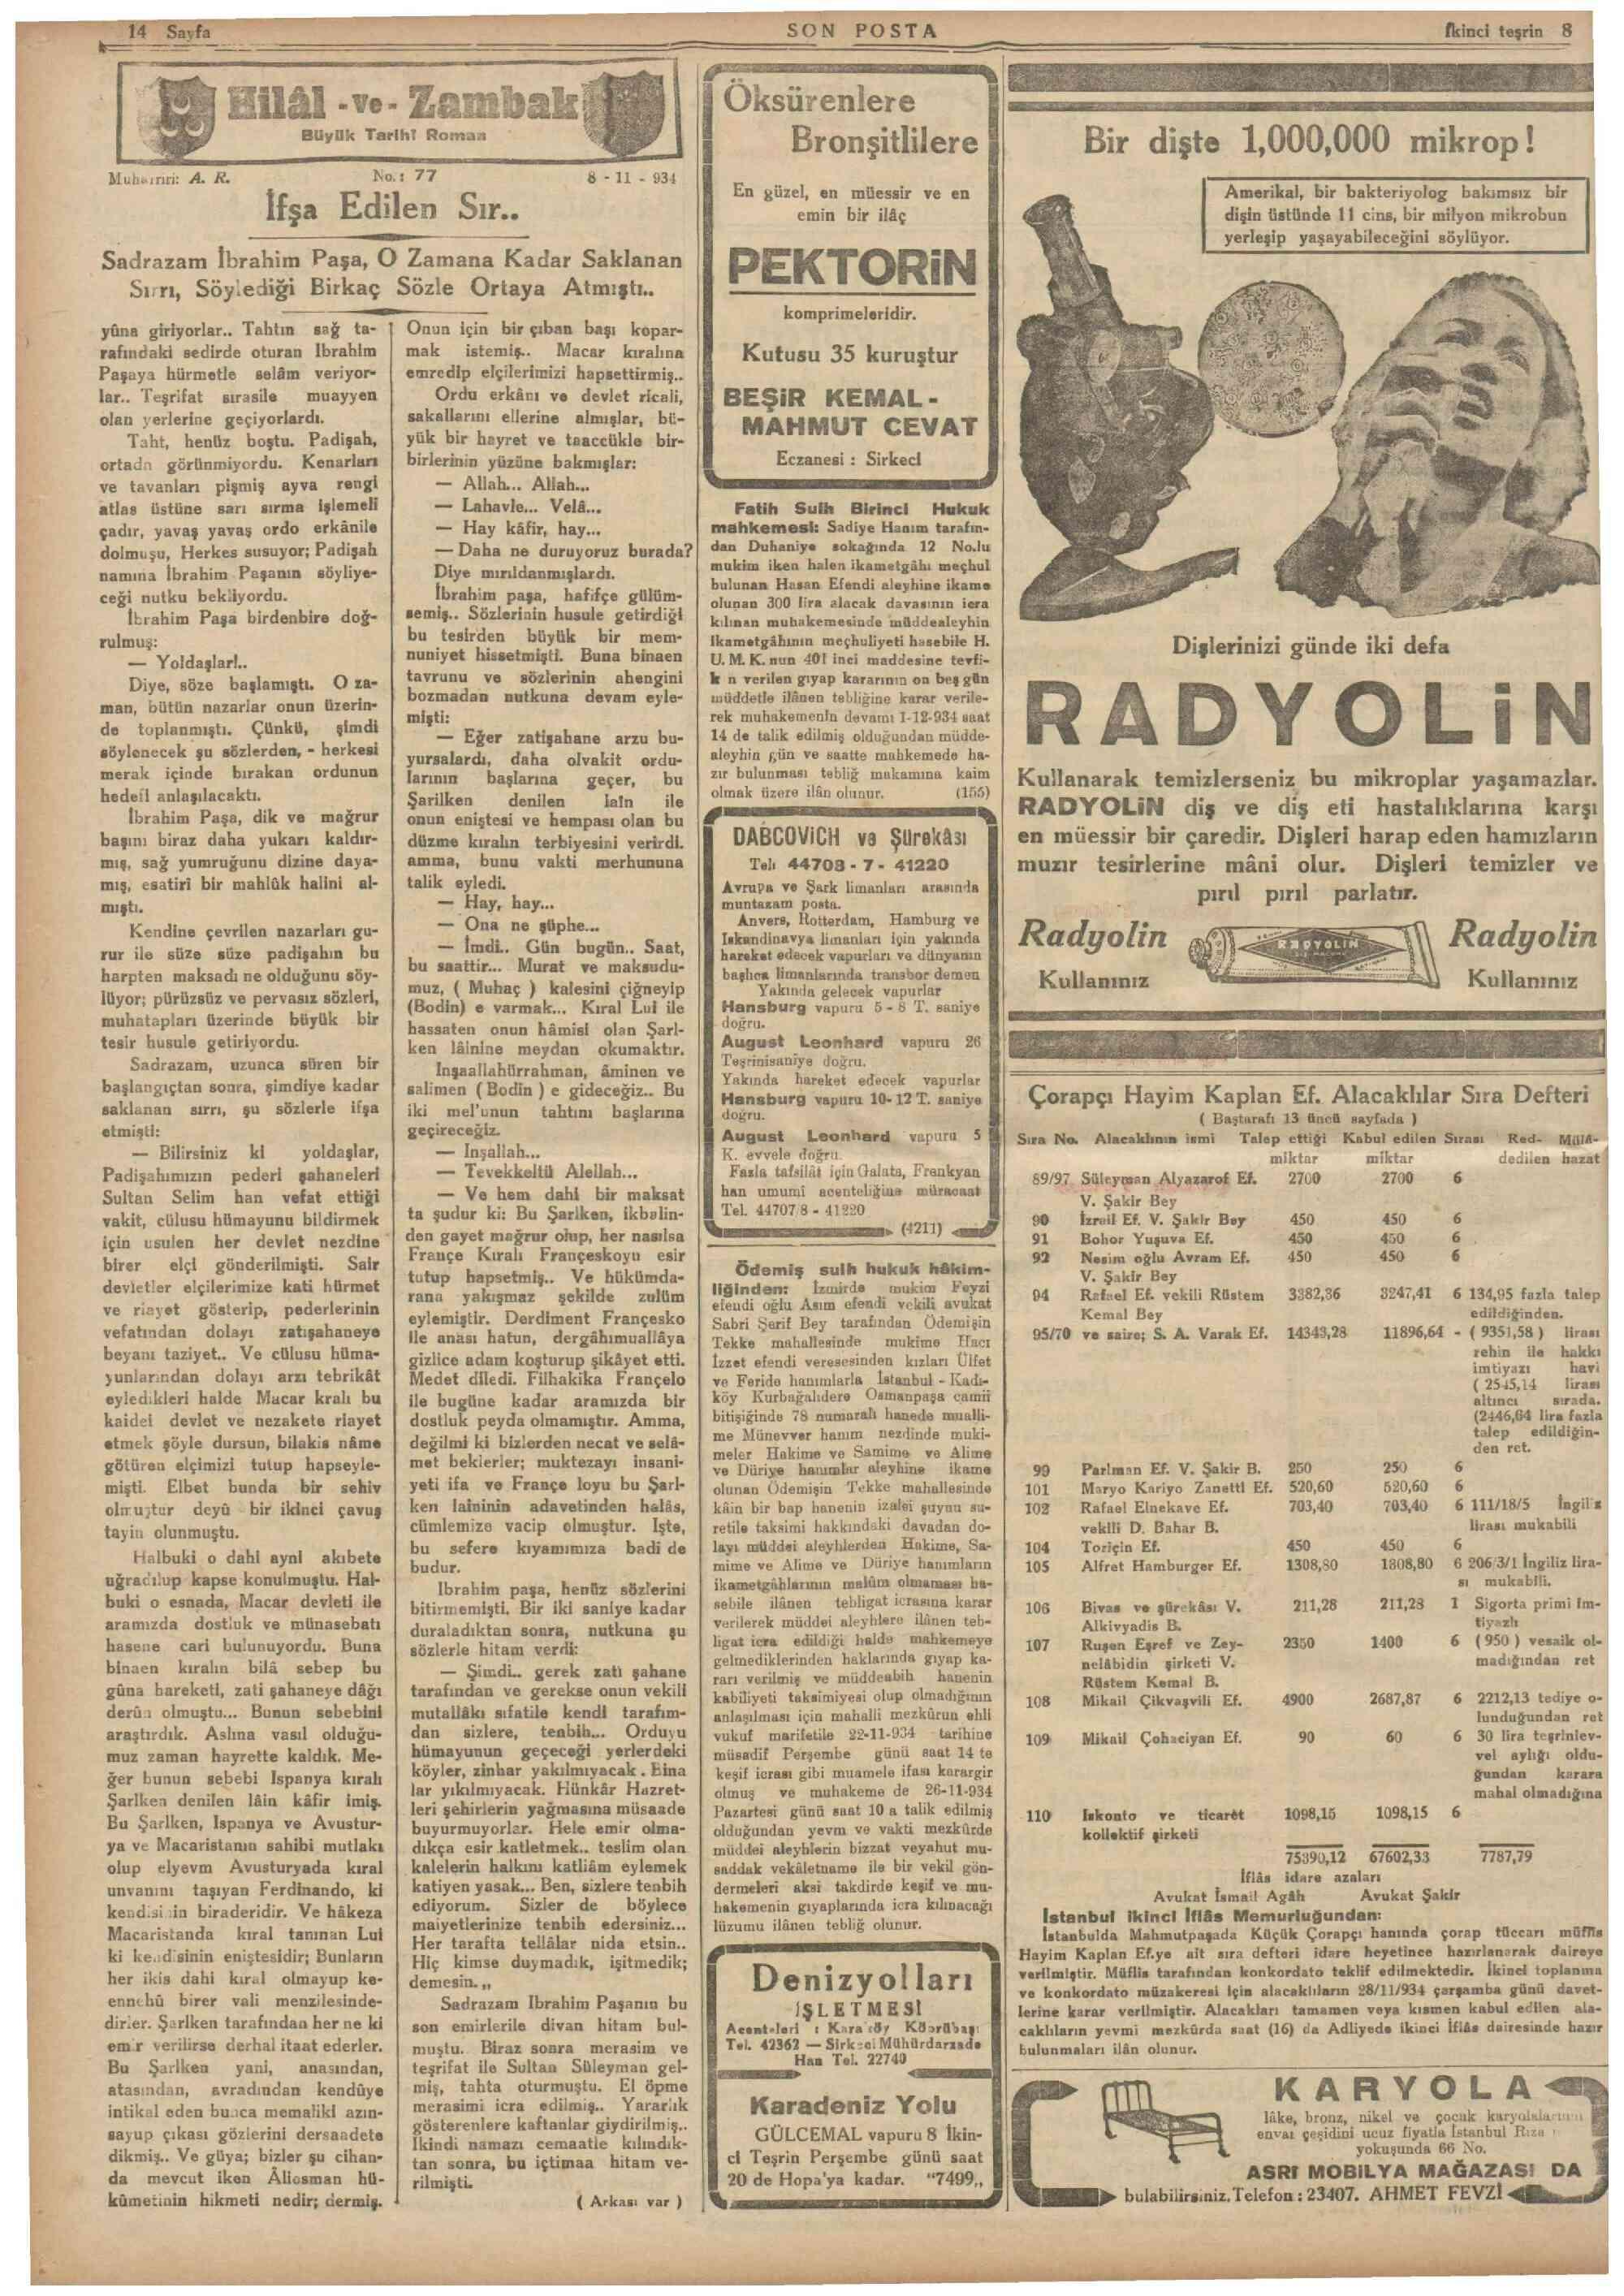 November 8, 1934 Tarihli Son Posta Gazetesi Sayfa 14